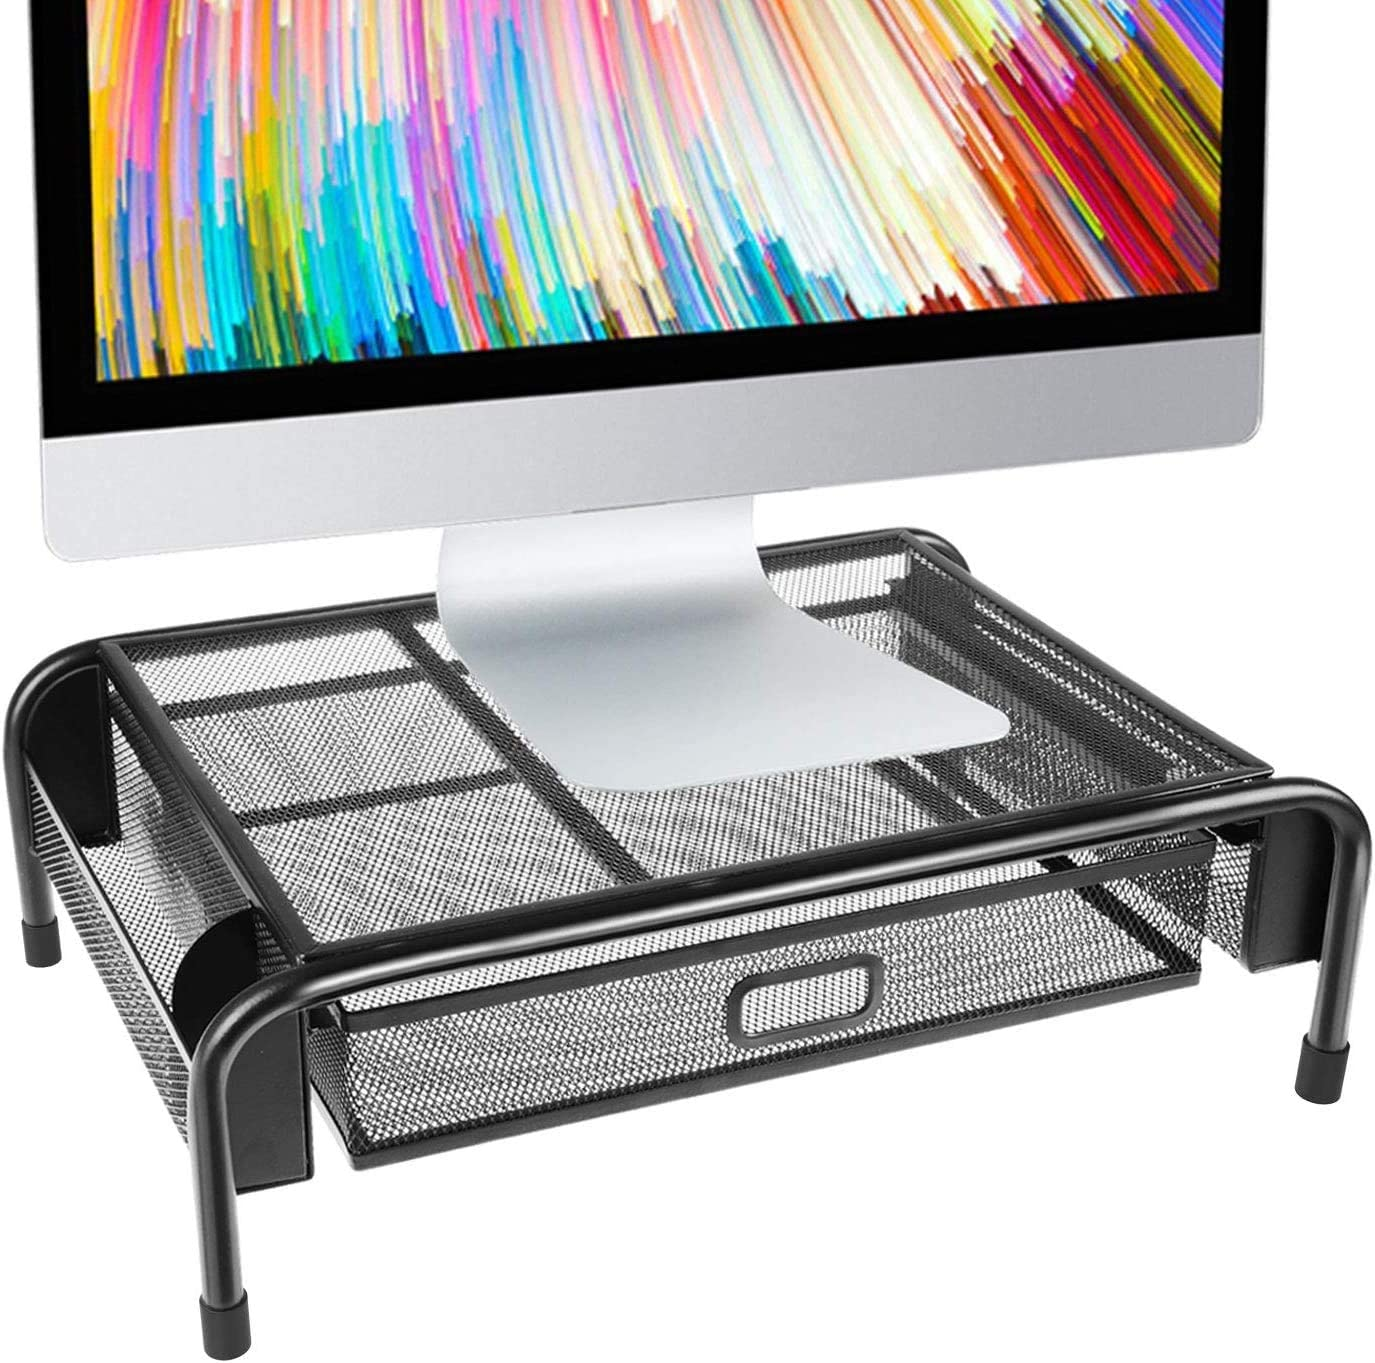 Monitor Riser Stand Mesh Metal Desk & Tabletop Organizer Monitor Mount Computer Laptop printer